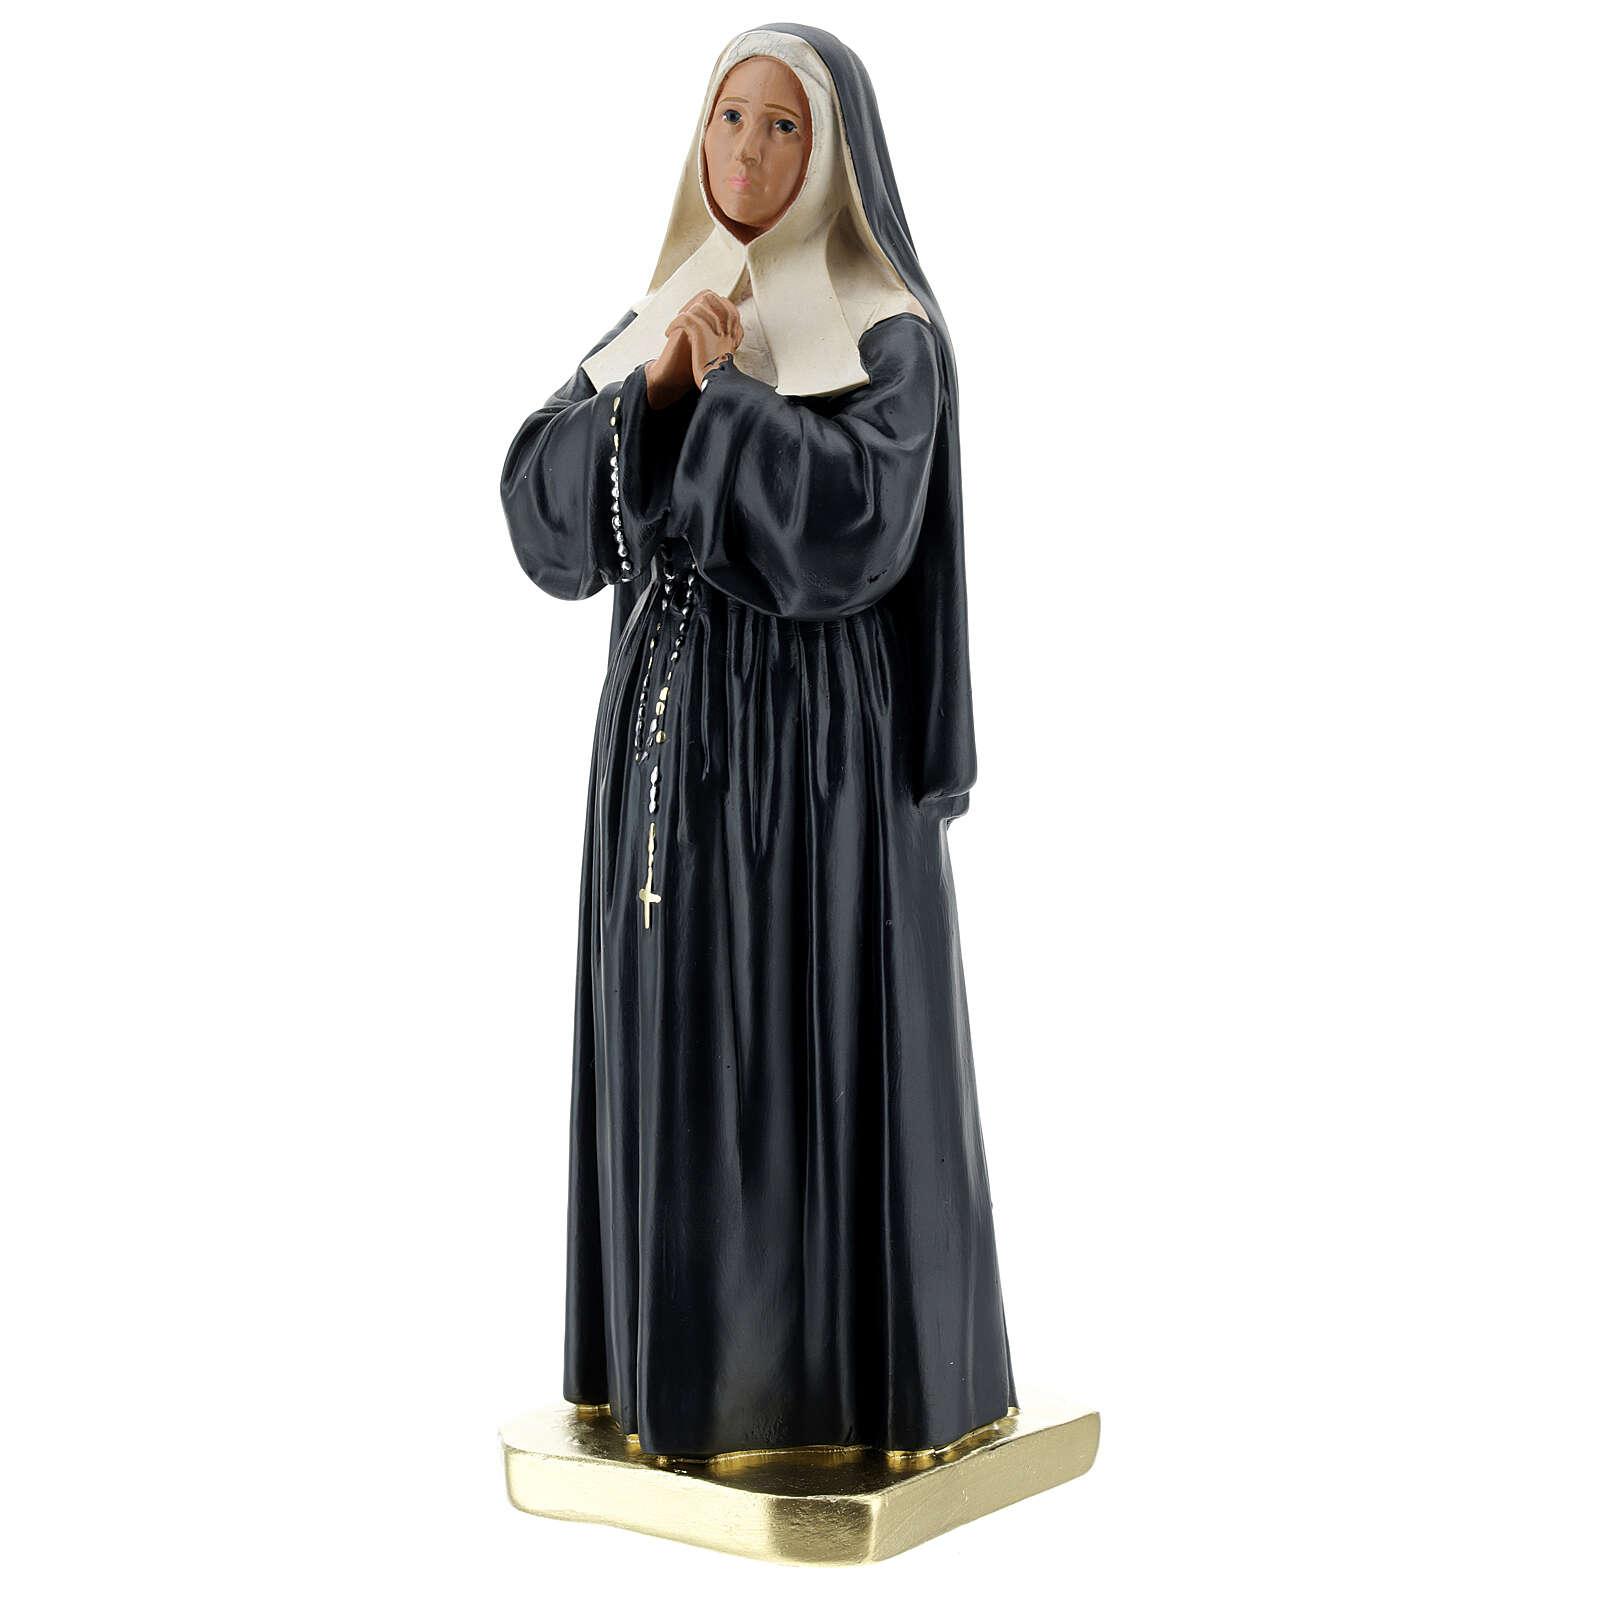 Saint Bernadette Soubirous plaster statue 30 cm Arte Barsanti 4